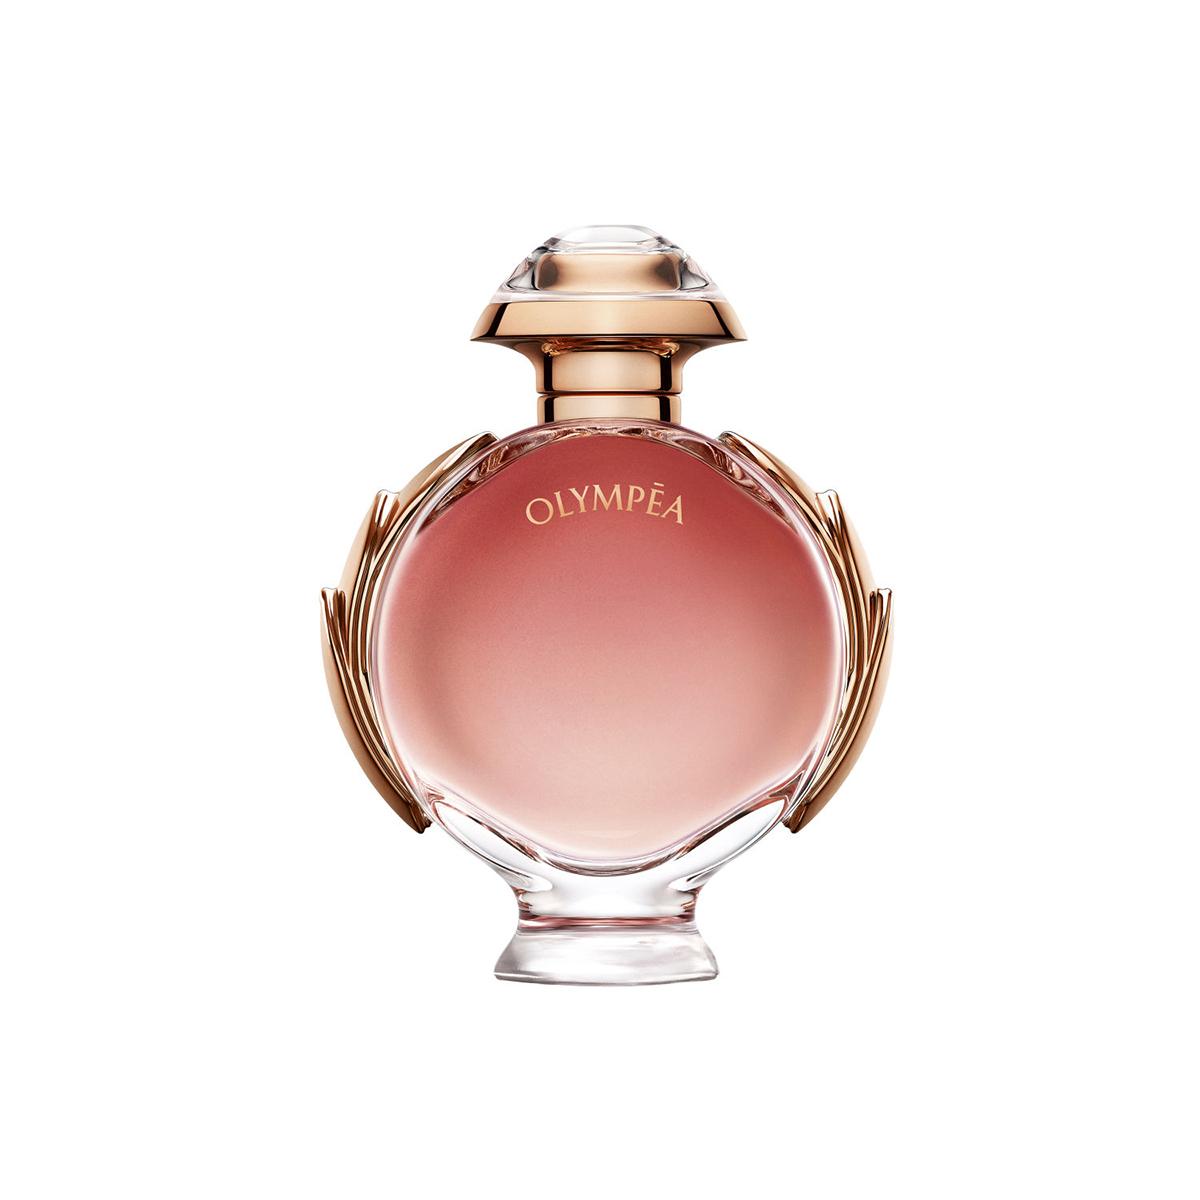 Paco rabanne olympea eau de parfum 80ml vaporizador edicion limitada